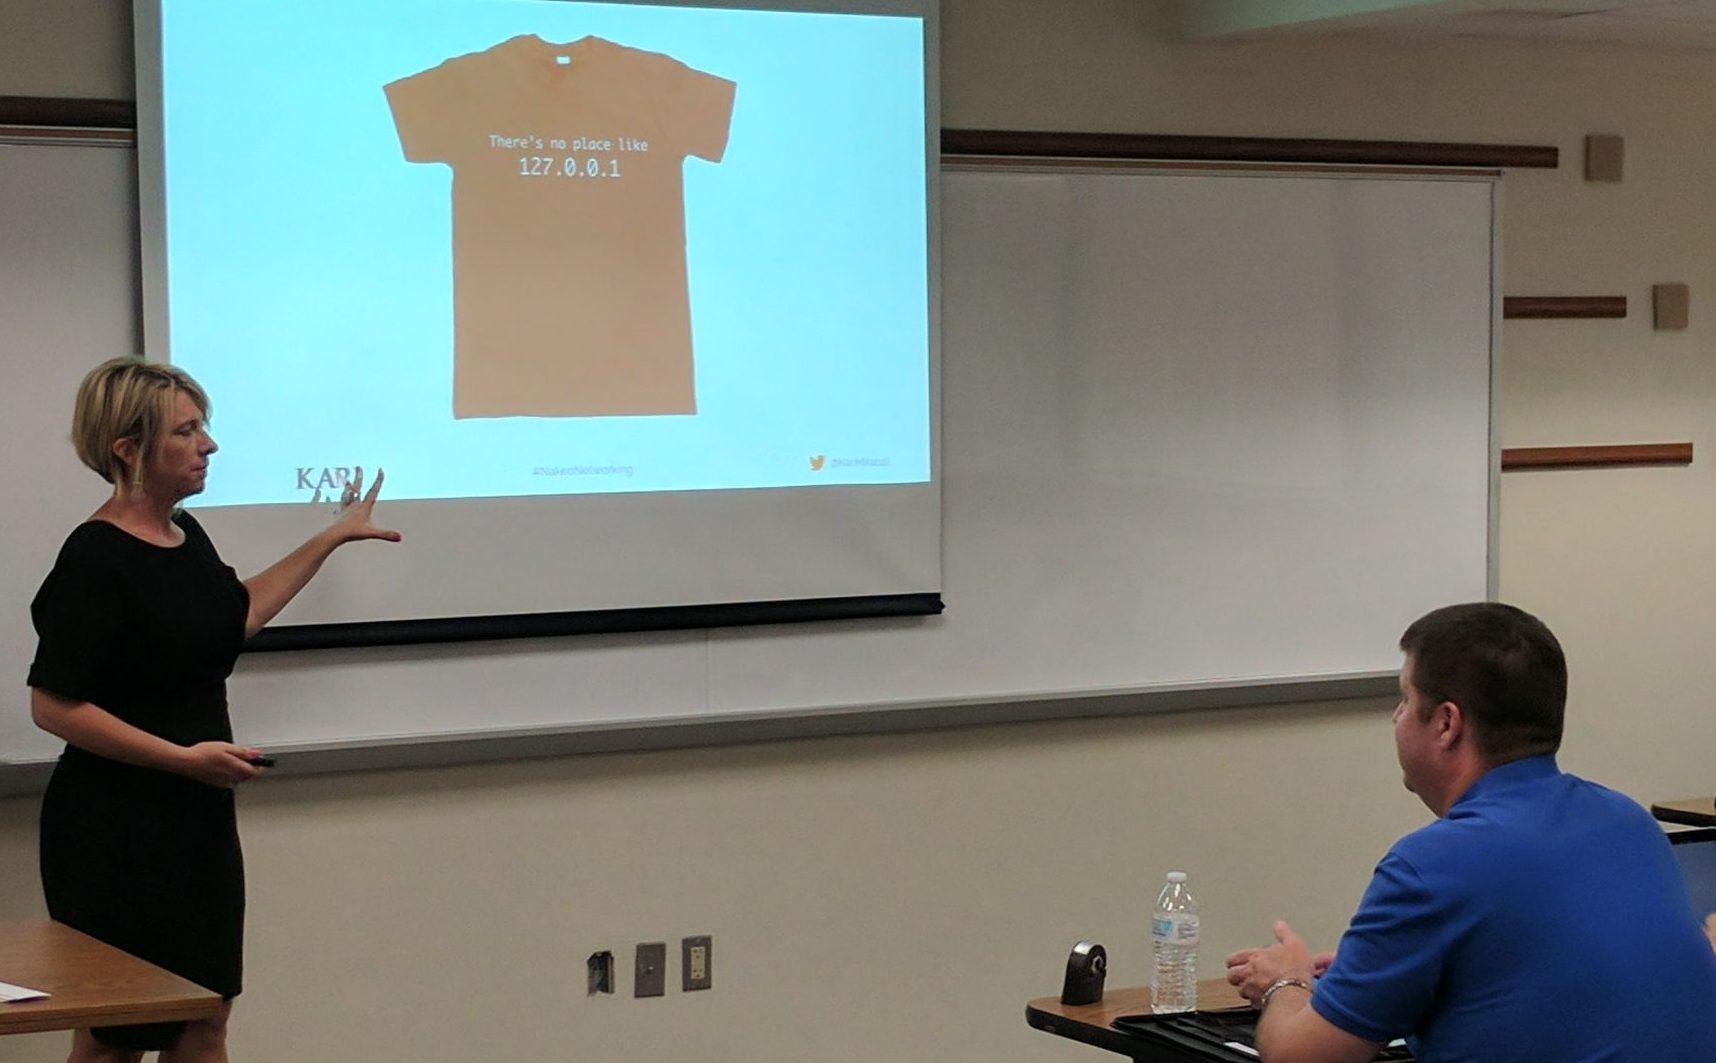 Kari Career Coaching Presentation